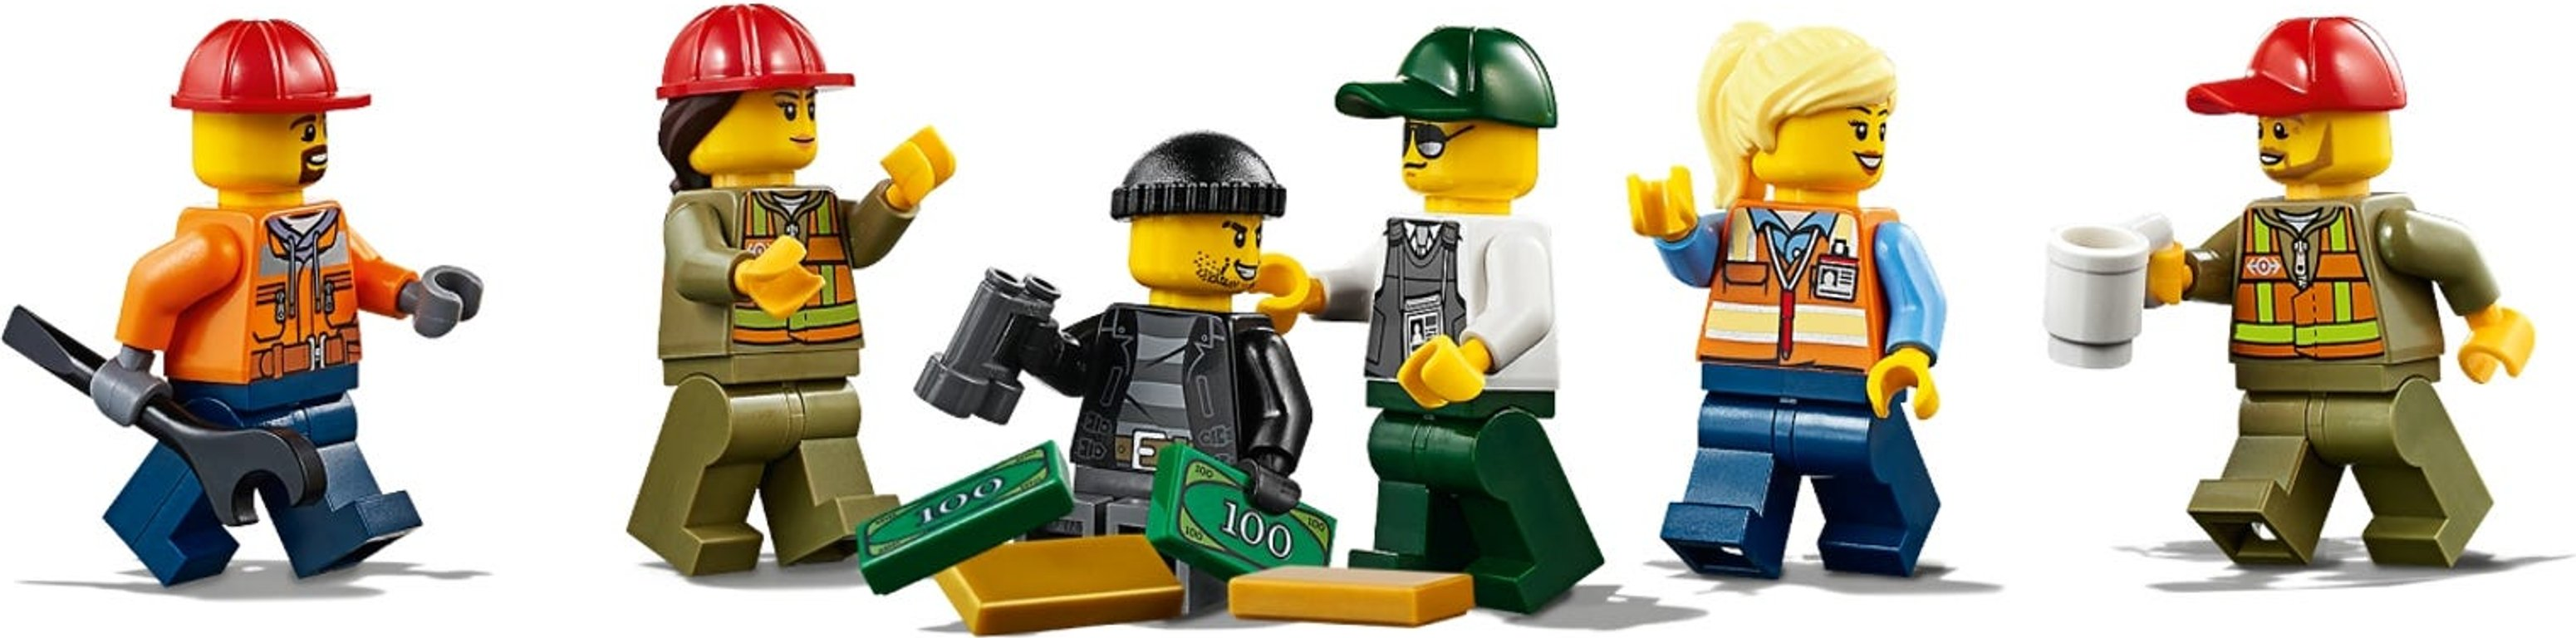 LEGO® City Cargo Train minifigures